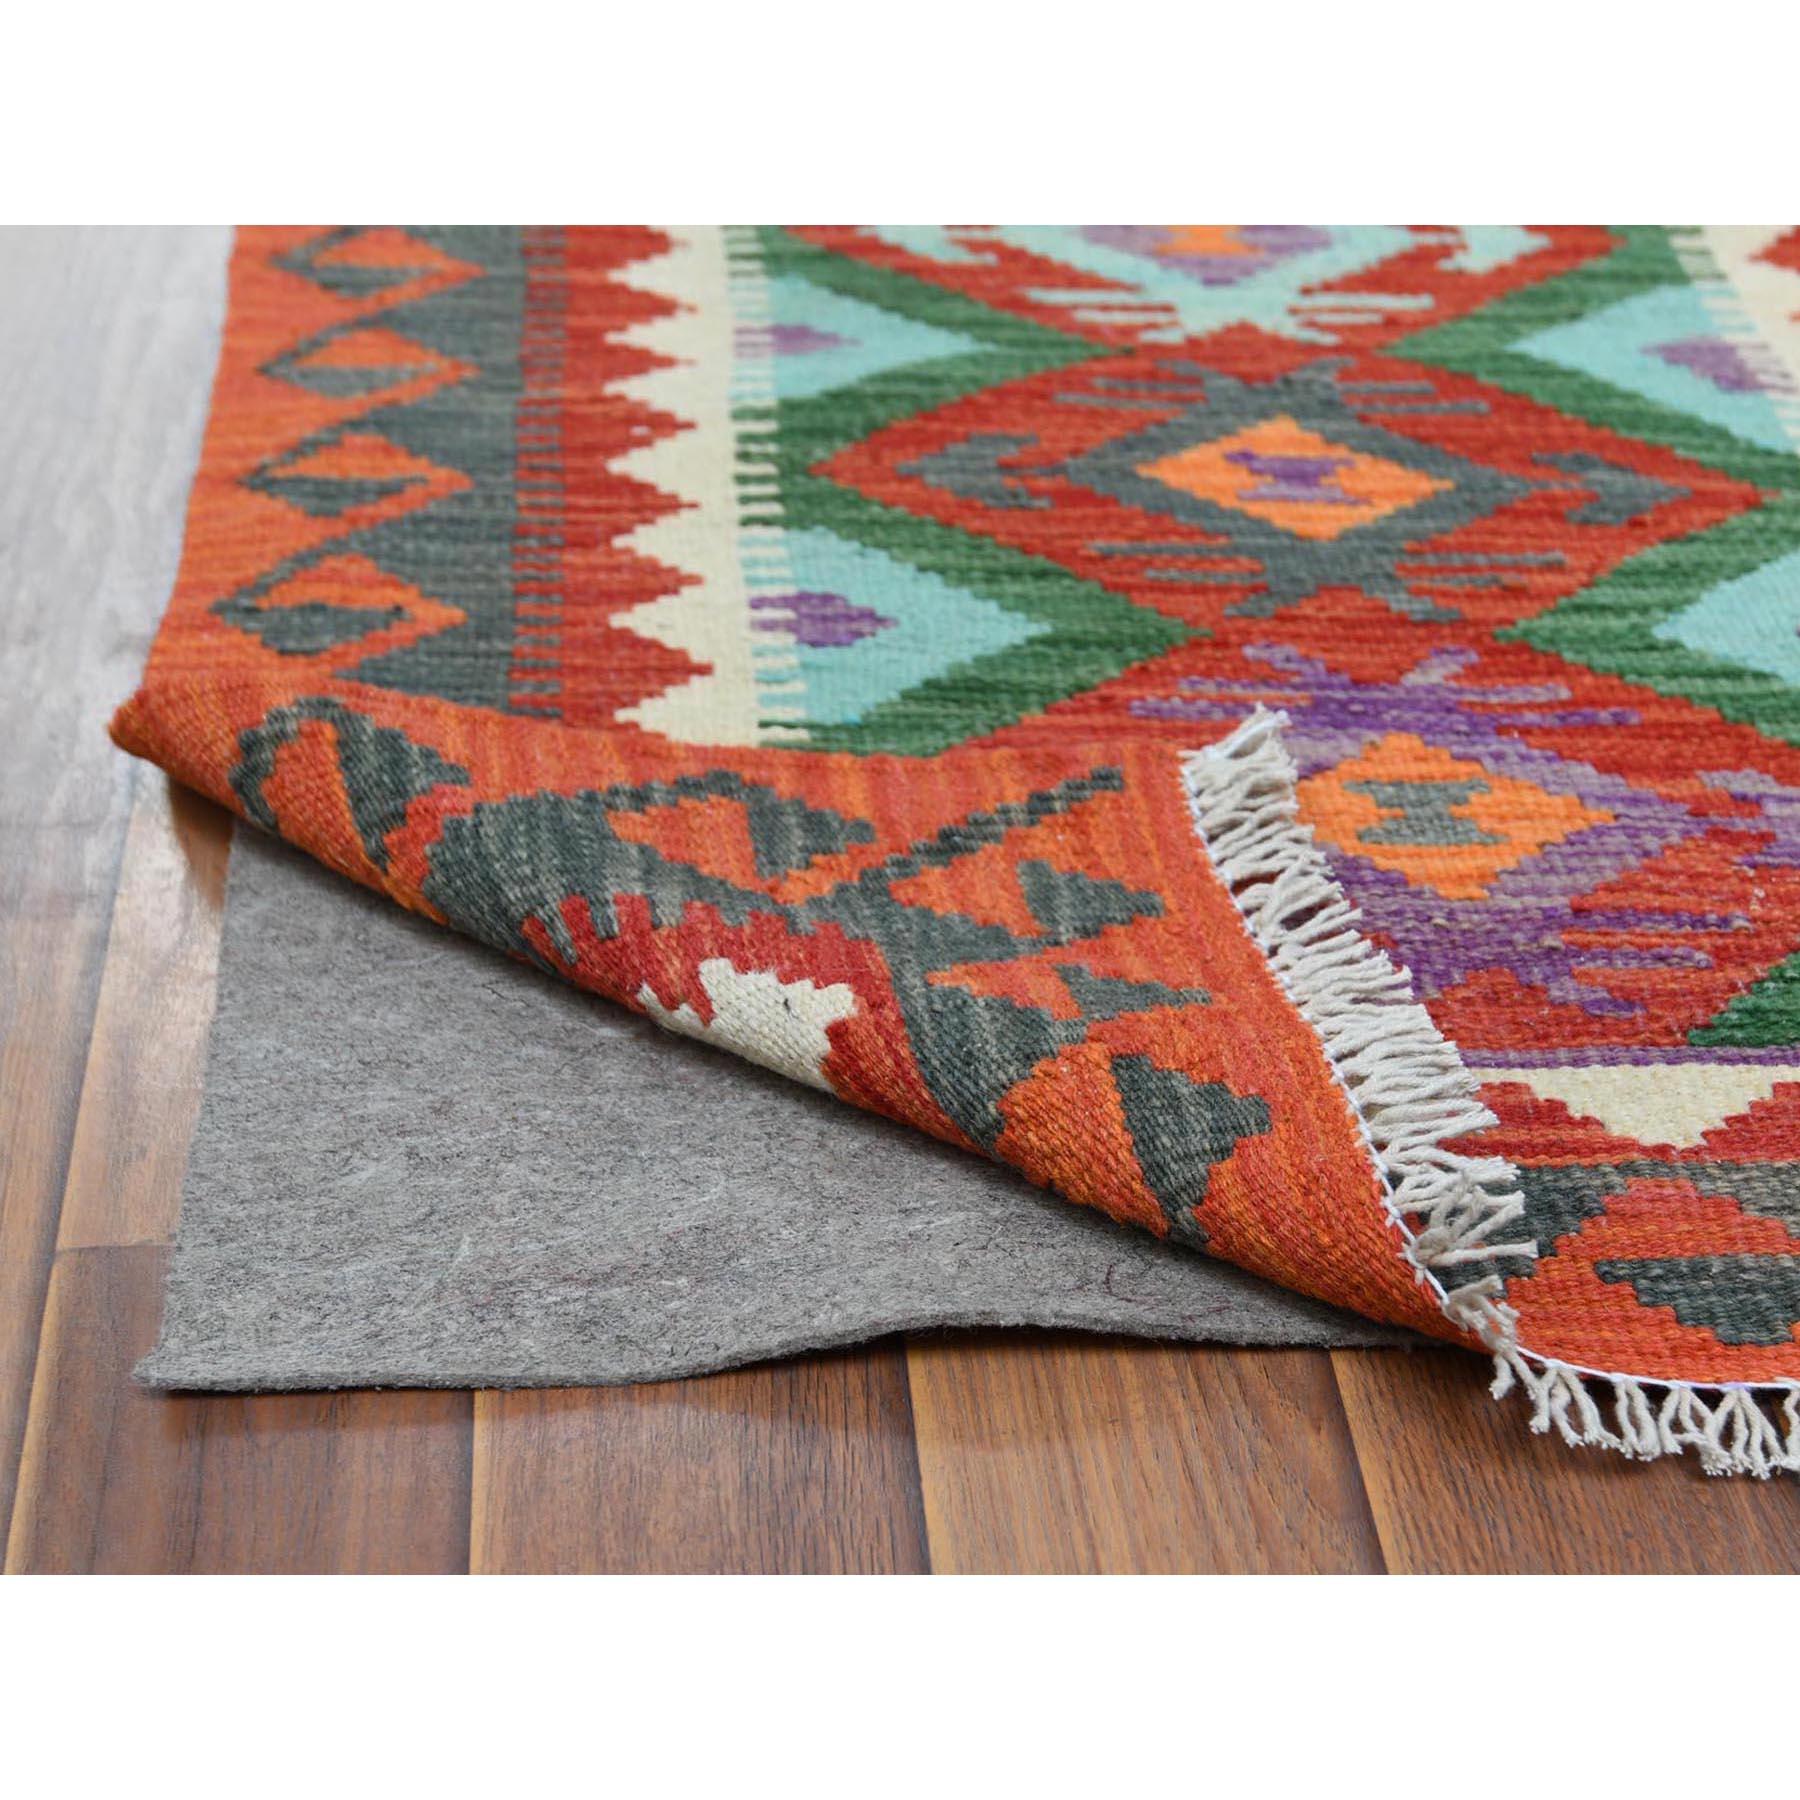 "2'2""x6'2"" Colorful Afghan Kilim Nomadic Design Luxurious Wool Hand Woven Oriental Runner Reversible Rug"